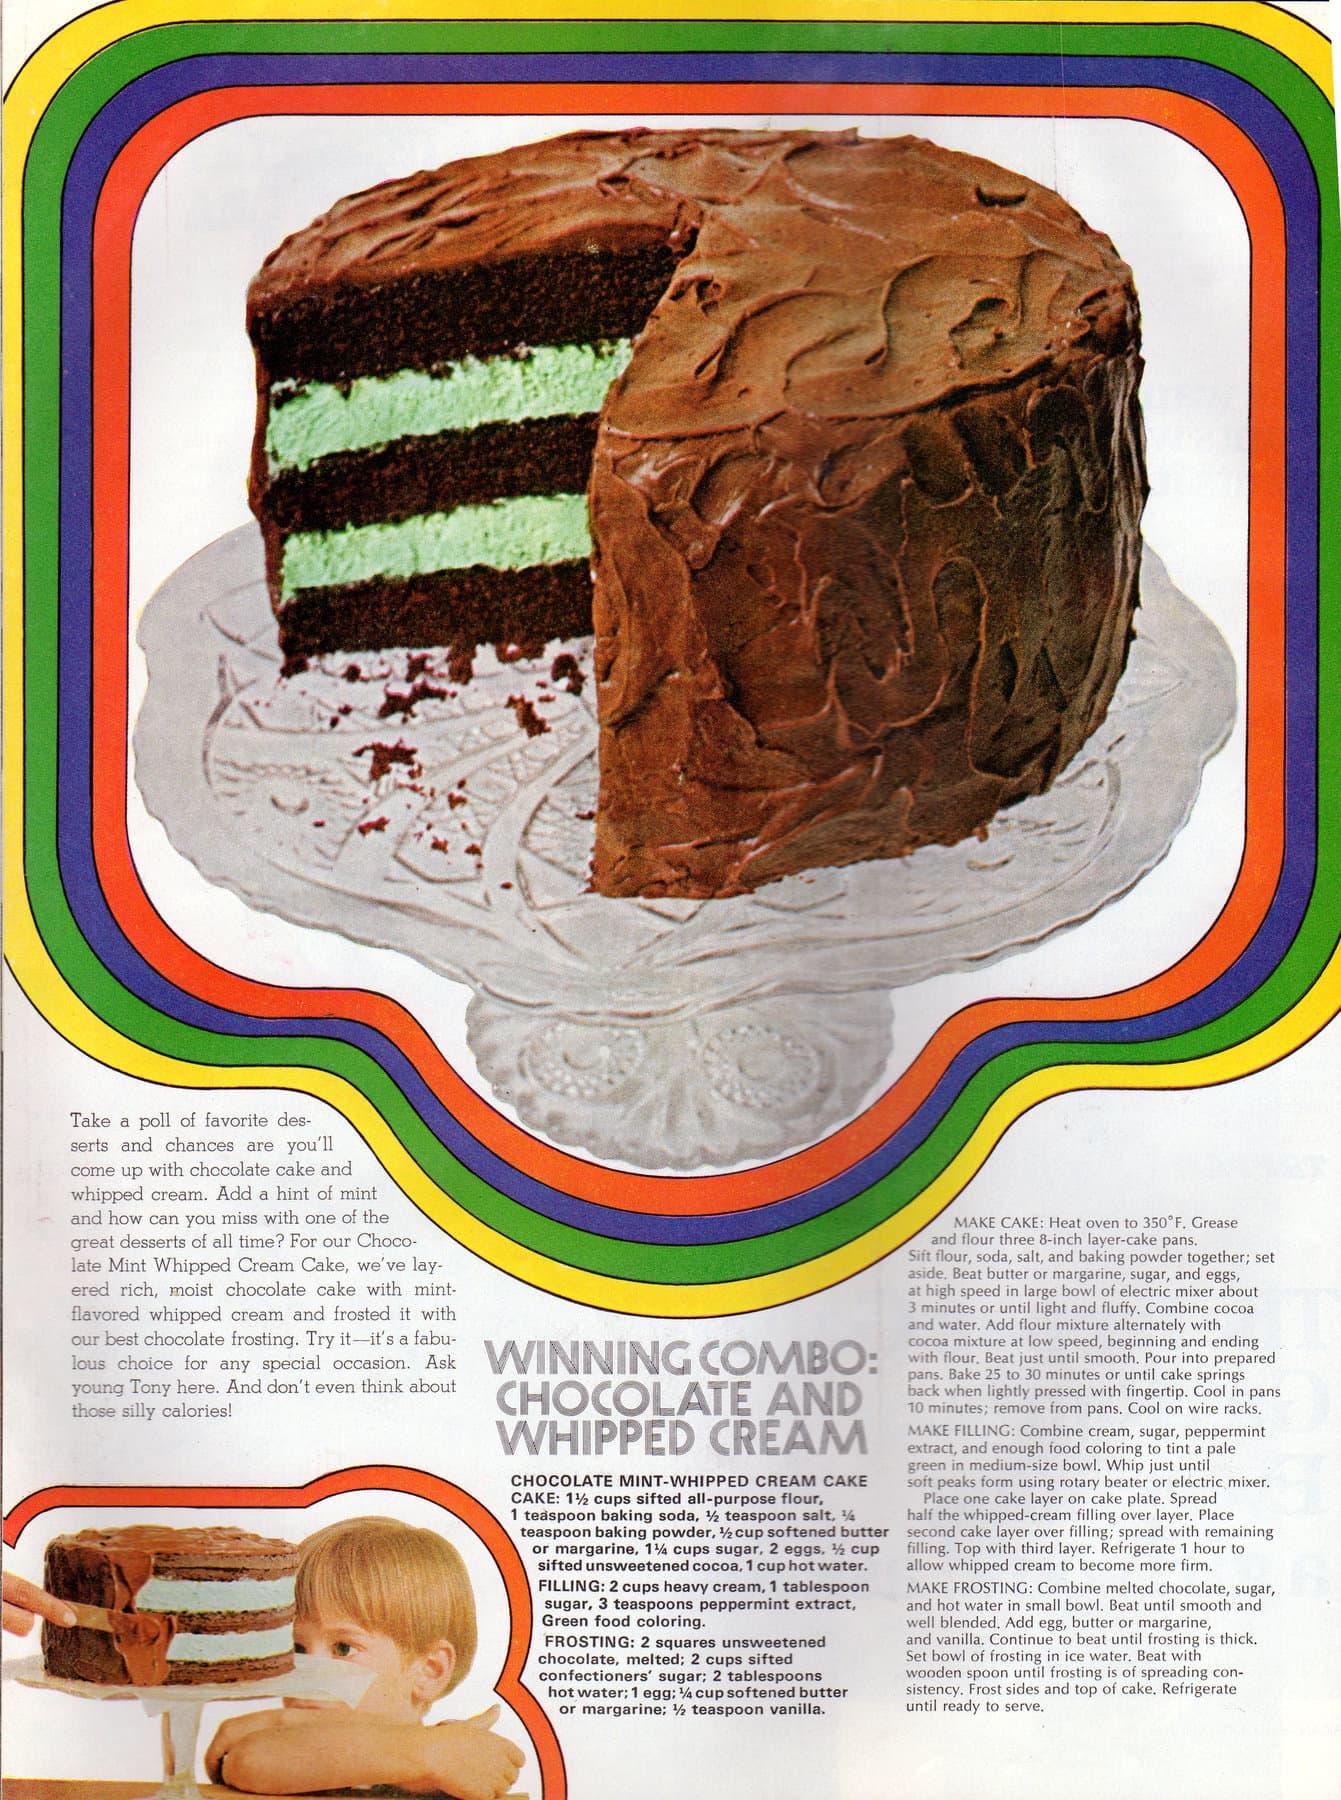 Chocolate mint-whipped cream cake recipe (1968)